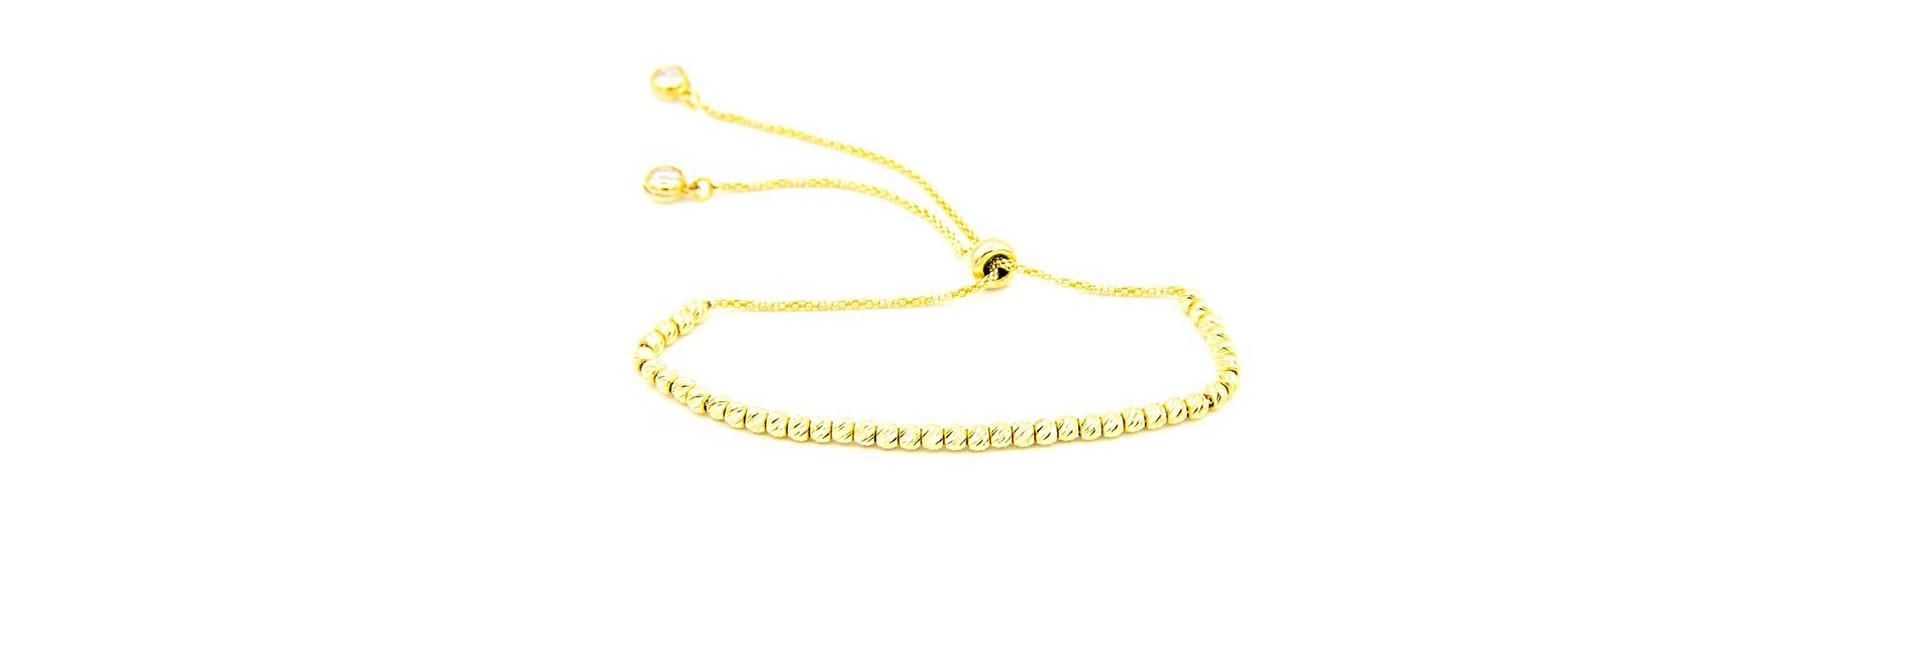 Armband met diamond cut balletjes en zirkonia's